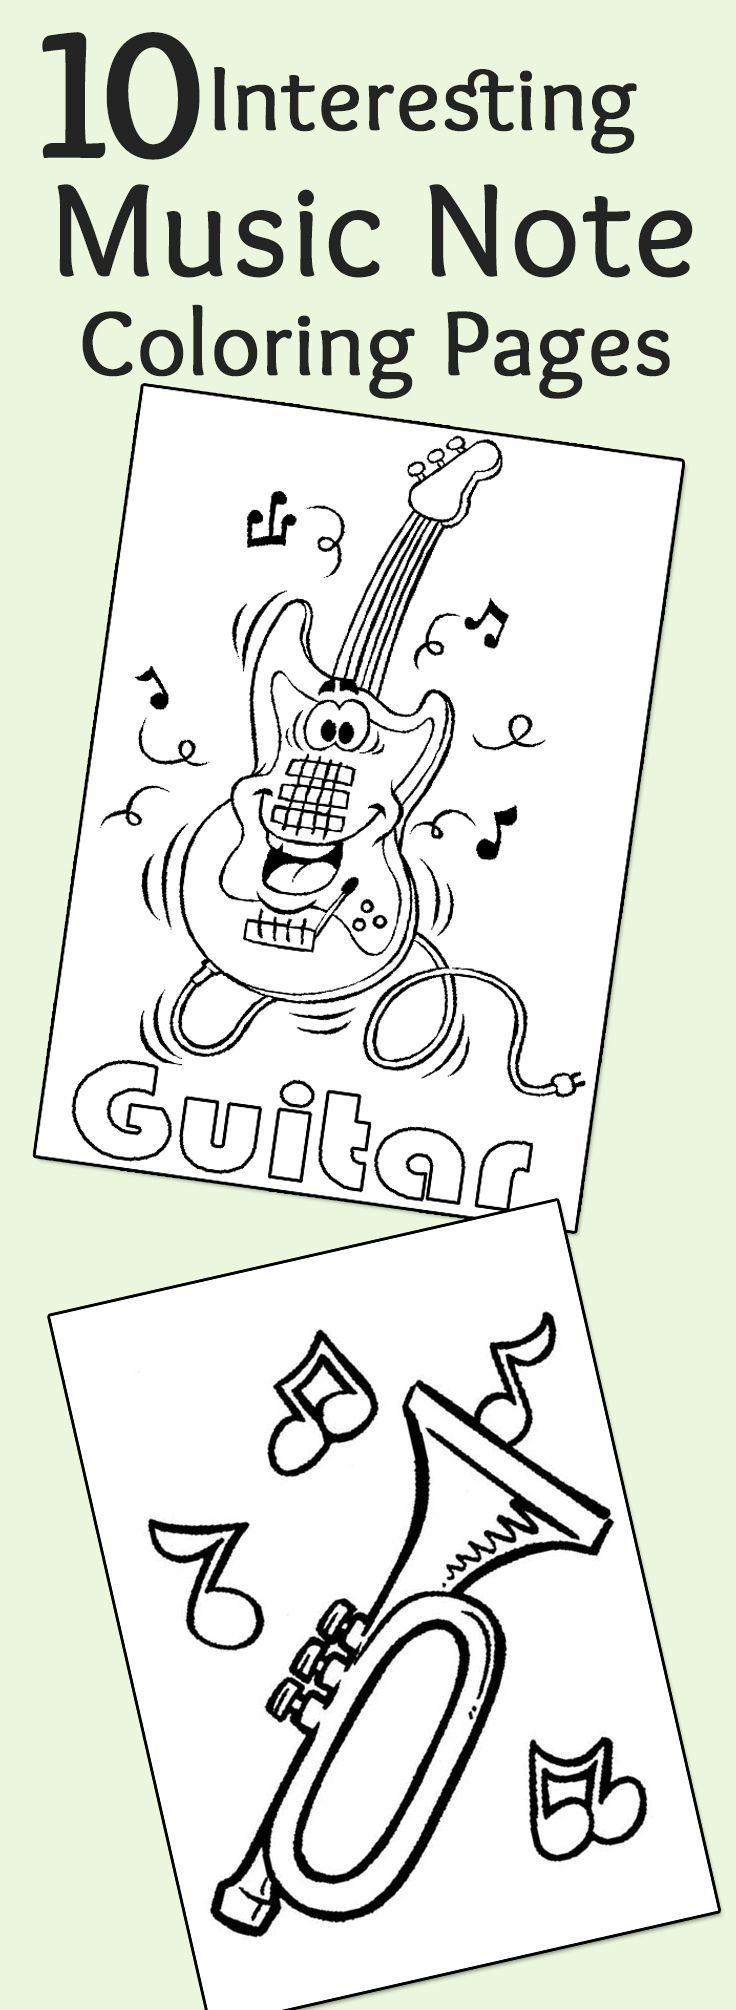 Drawn music notes child Pinterest notes on ideas art